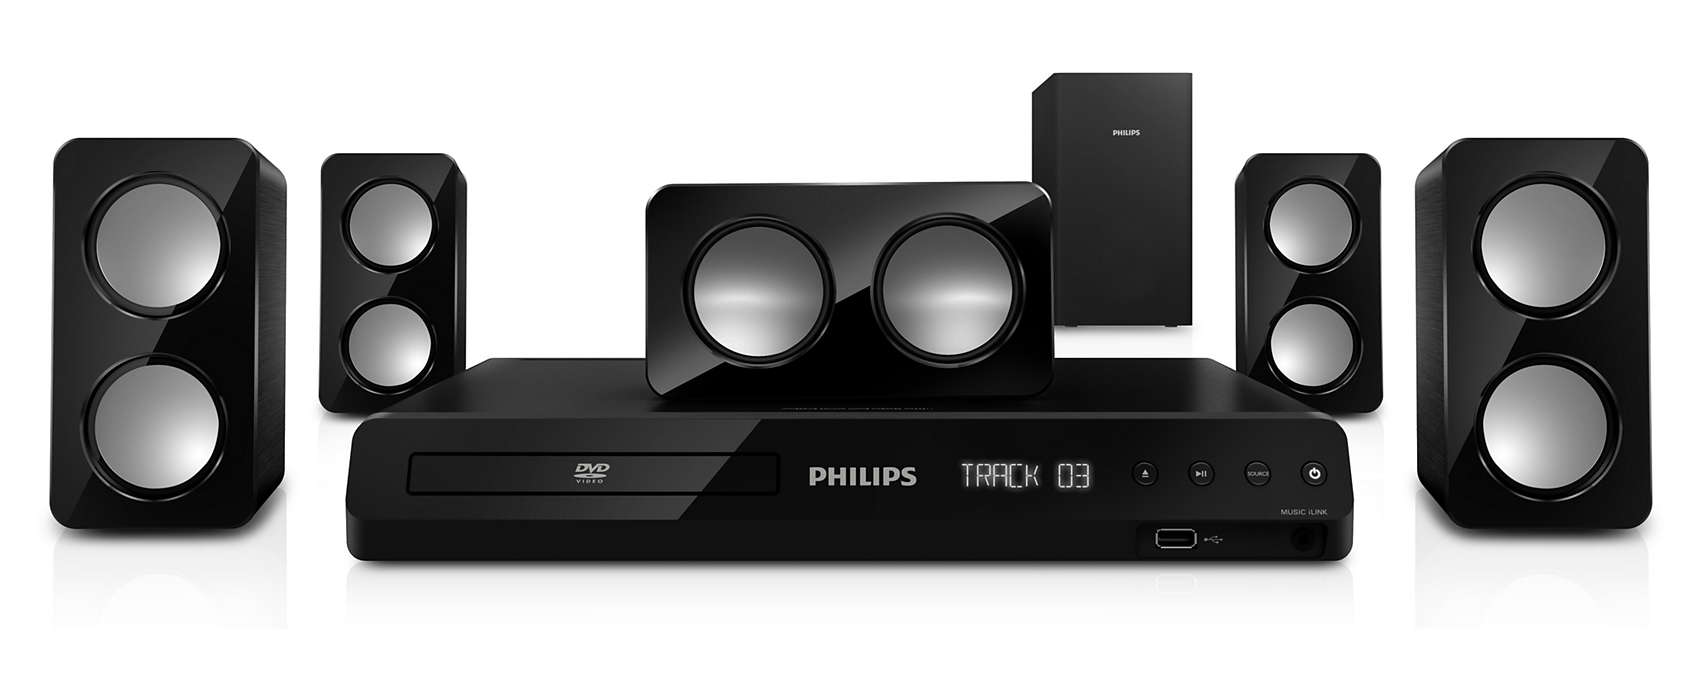 39b8af556 Immersive Sound Home theater HTS3532BL 94